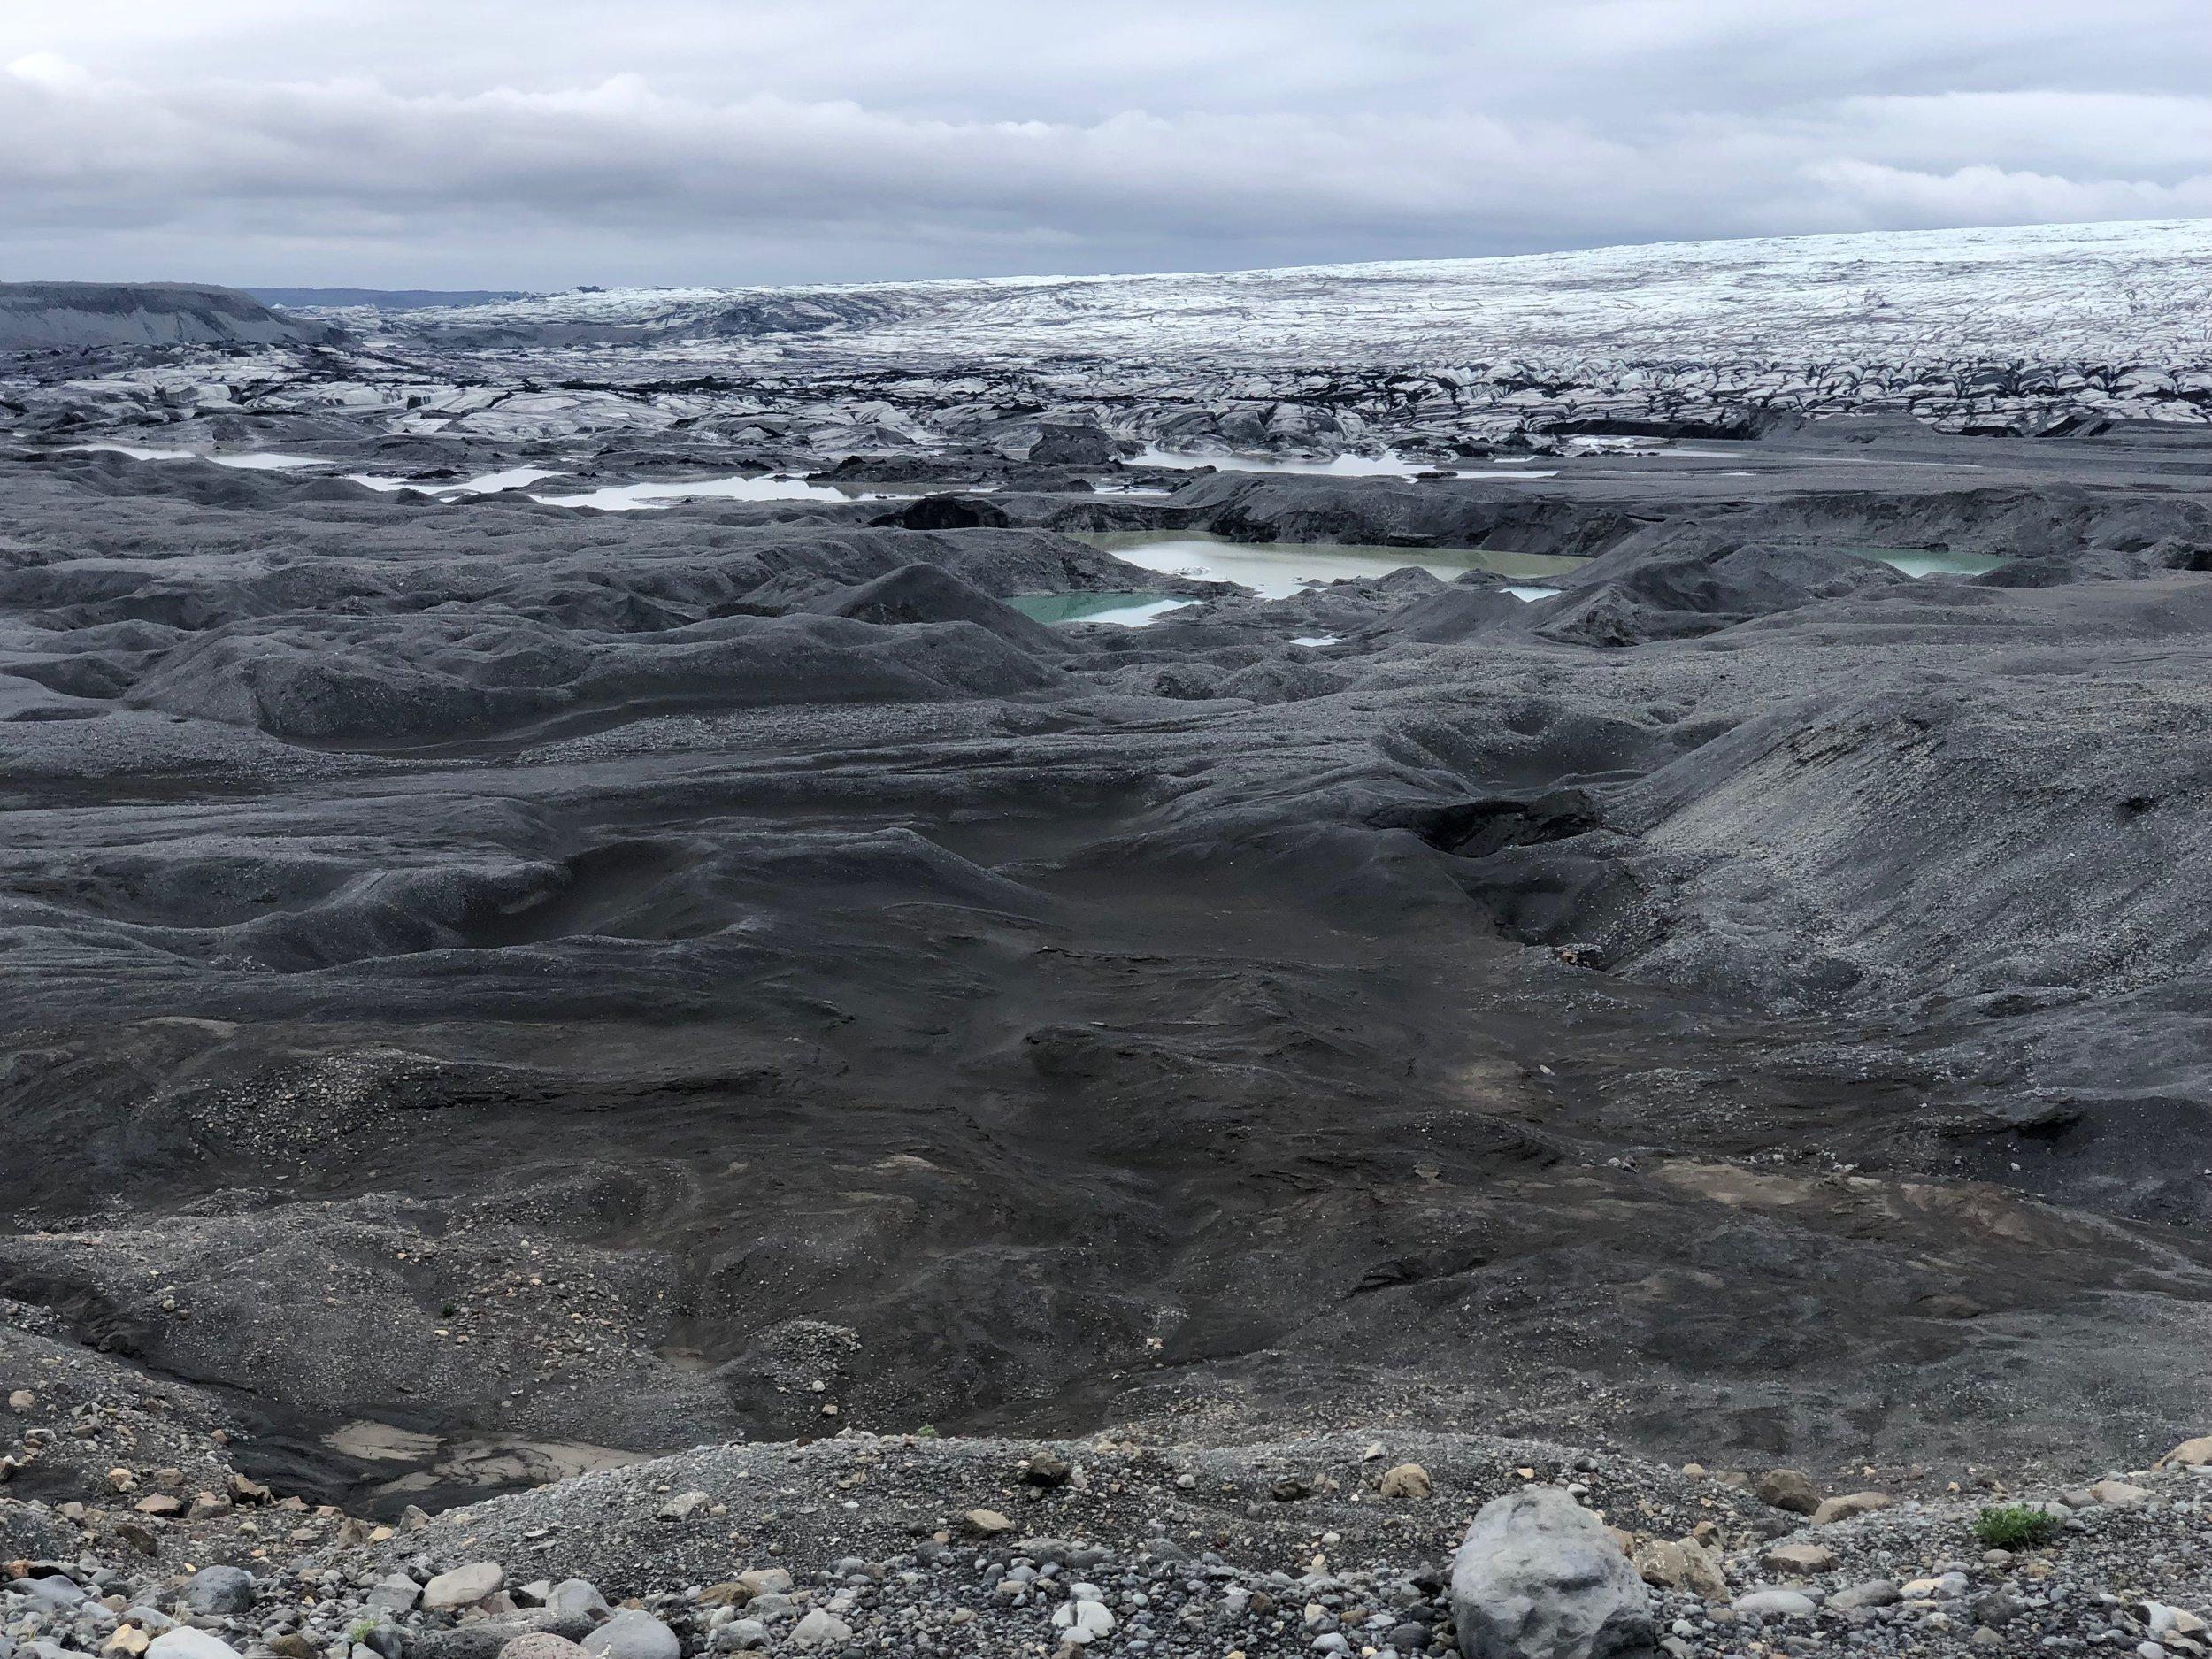 Terminus of a vast glacier.